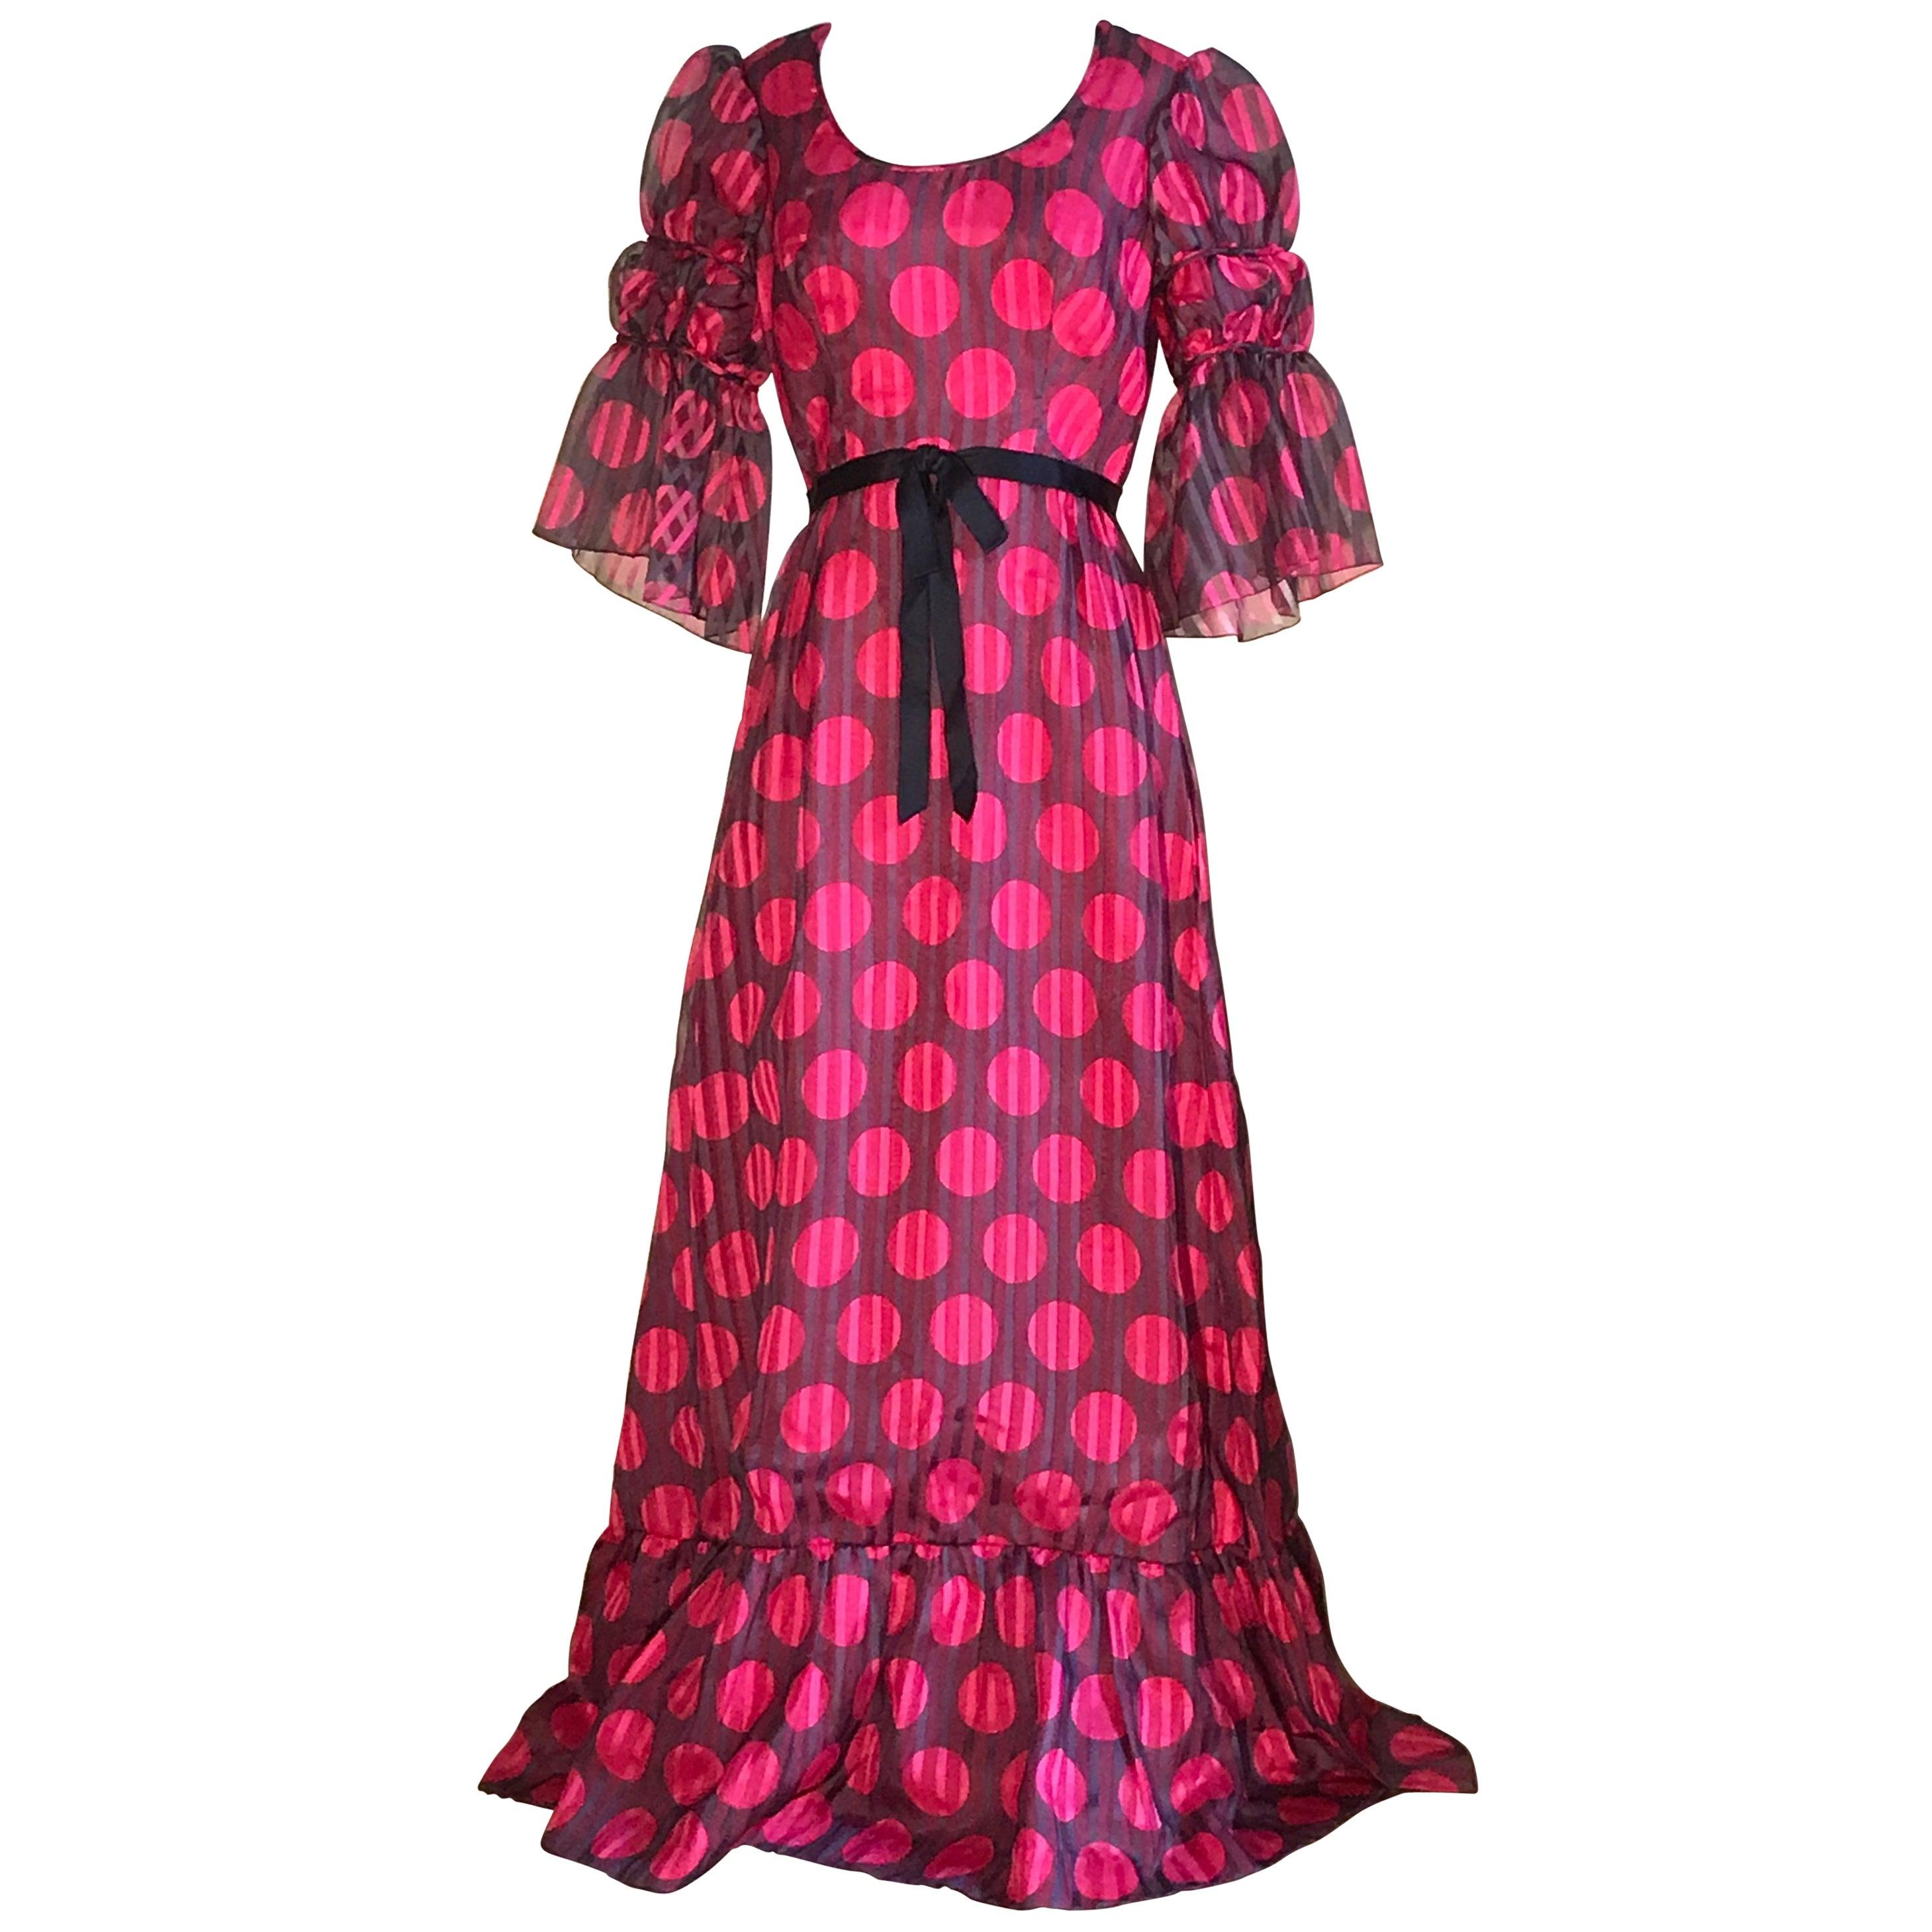 Sarmi 1960s Pink and Brown Polkadot Stripe Dress with Puffed Sleeve Detail